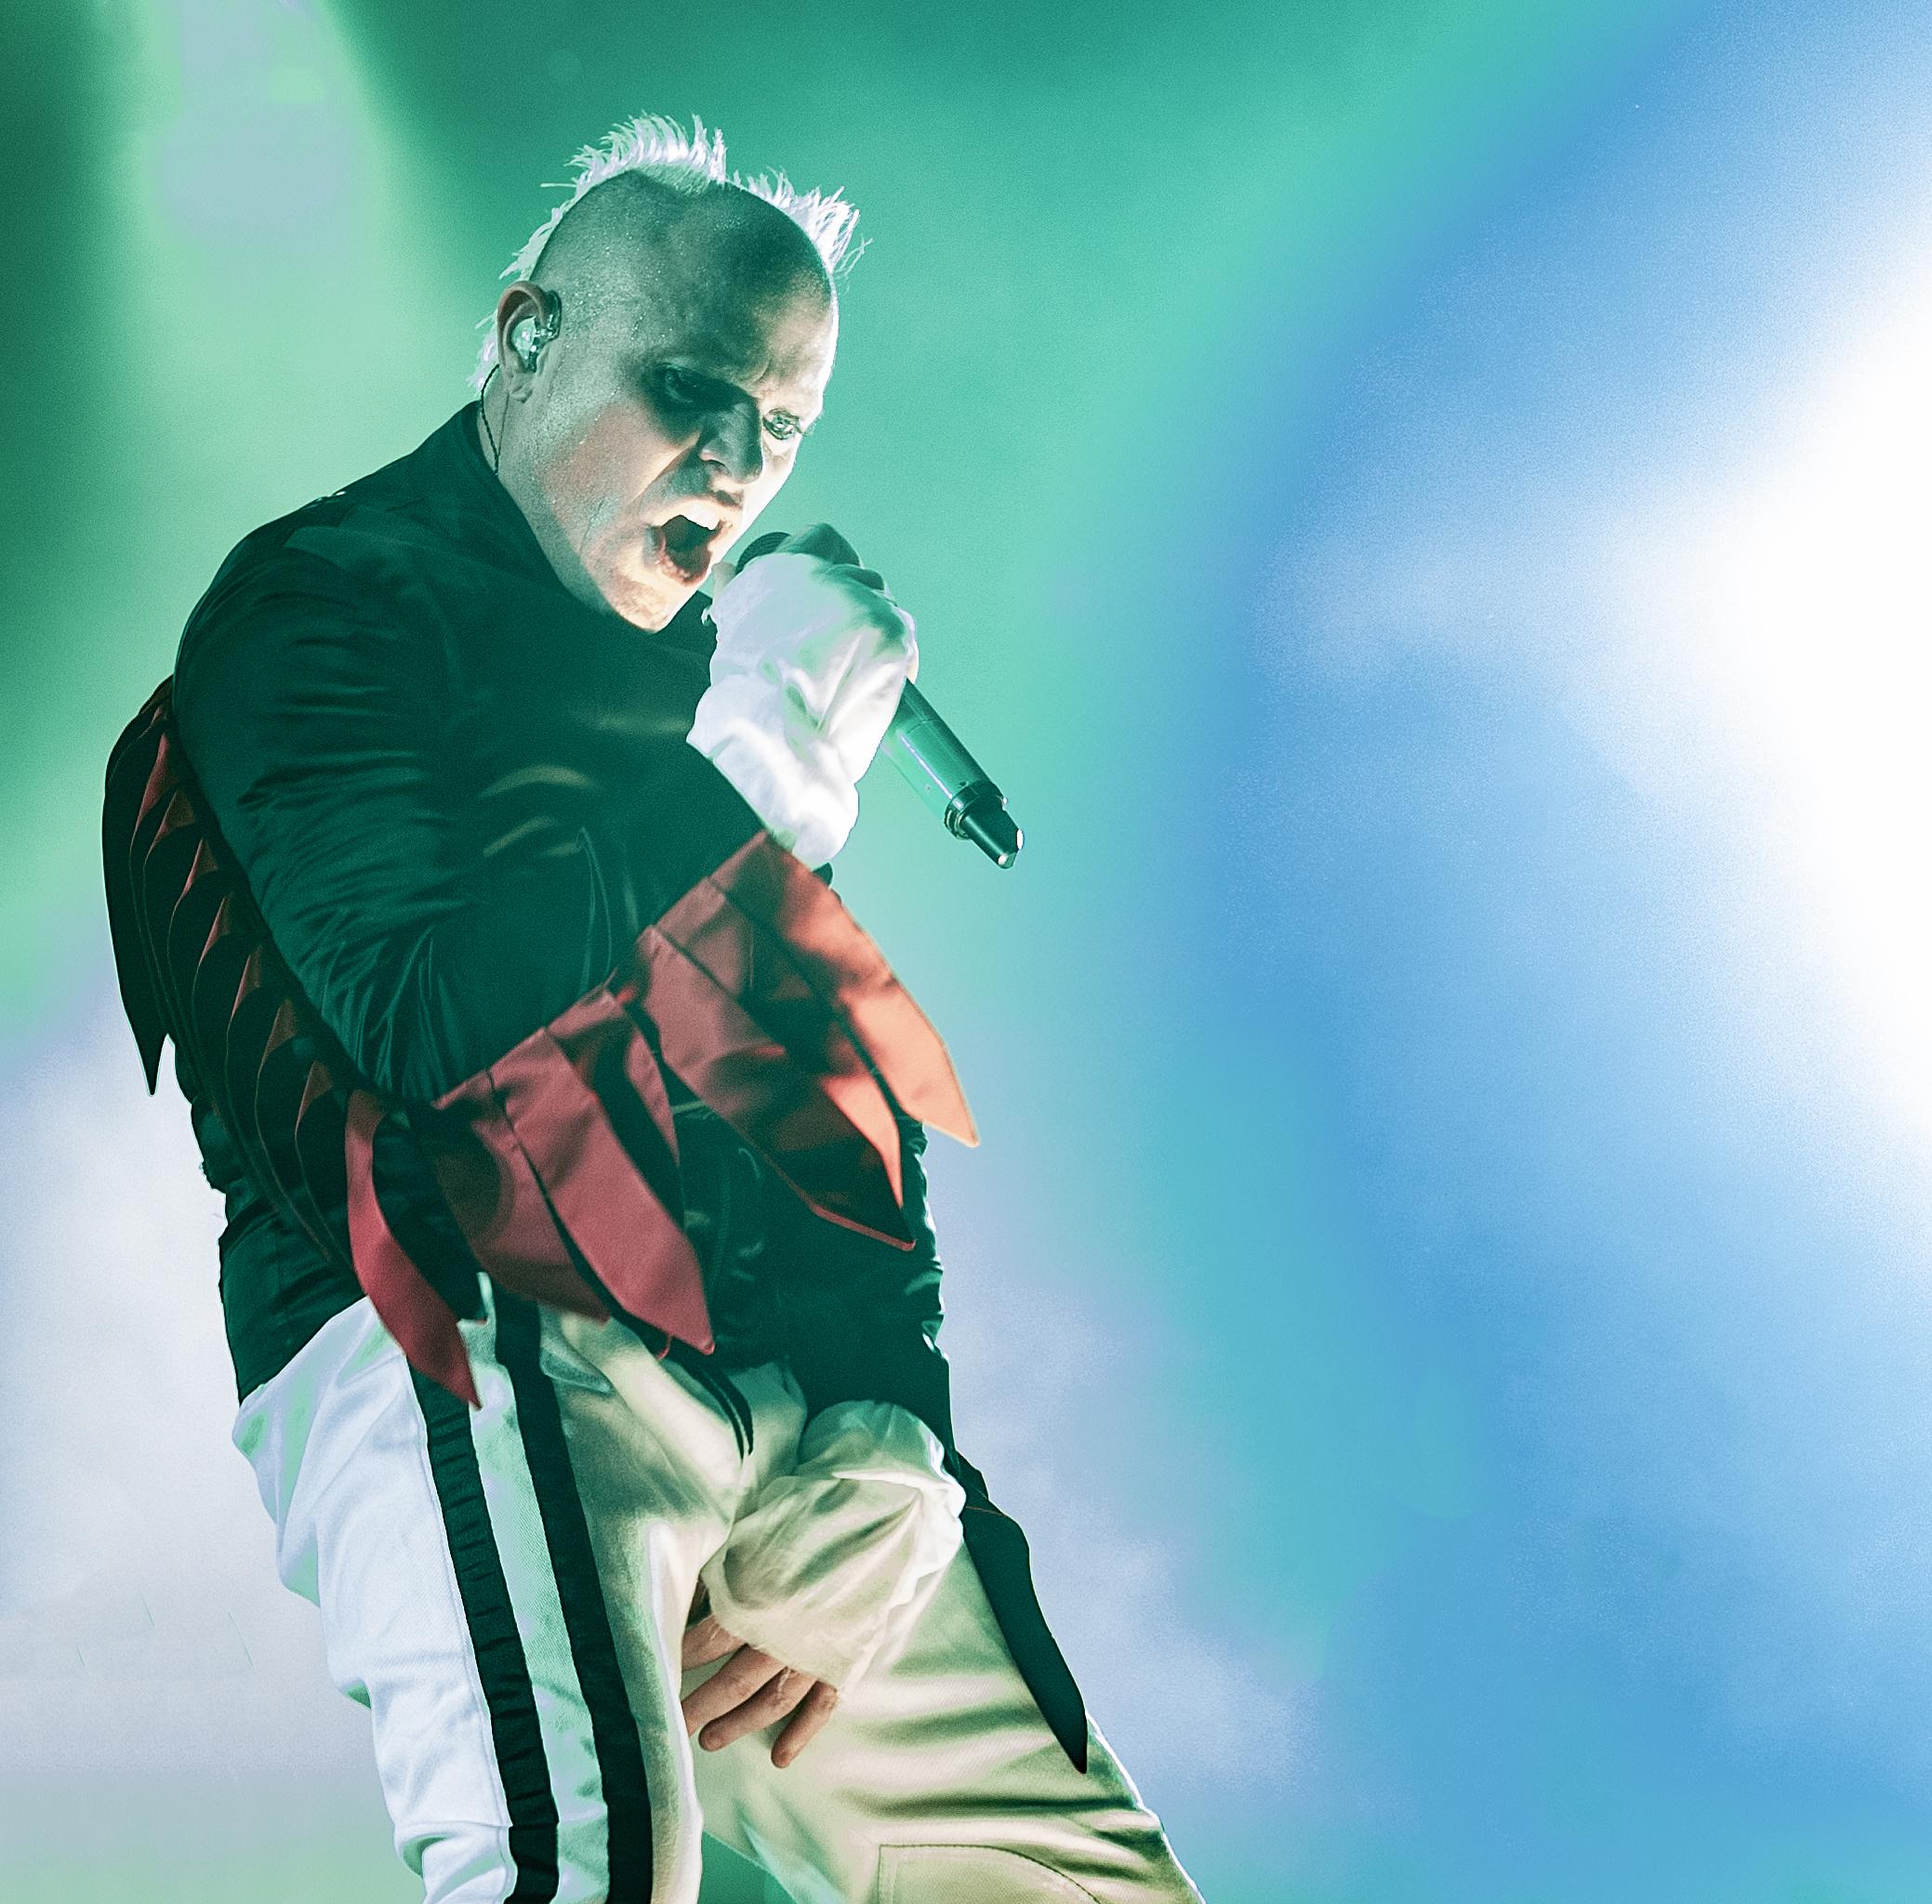 Keith Flint - The Prodigy